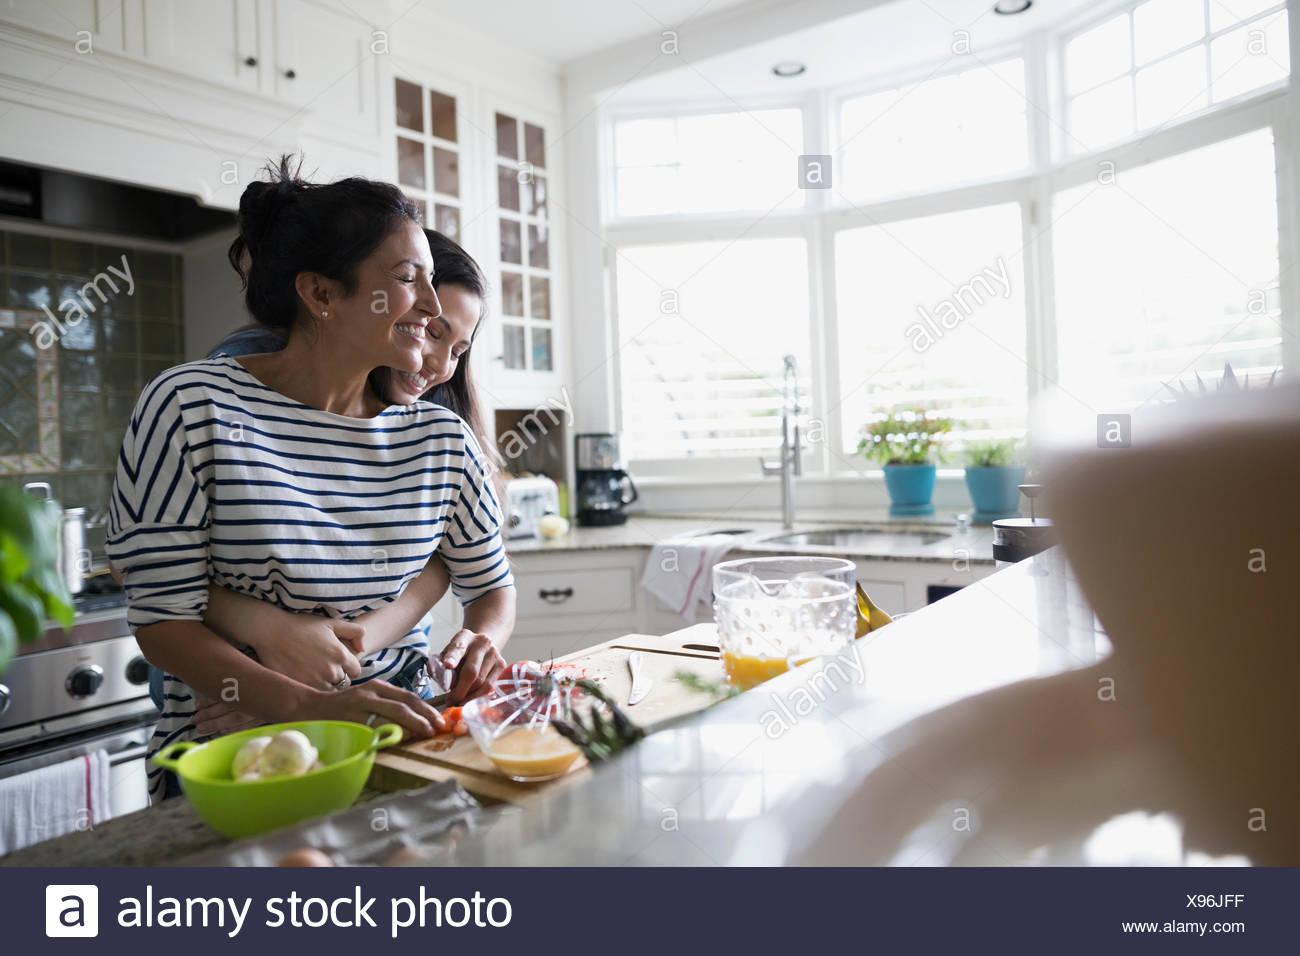 Hispanic Mother Cooking In Kitchen Stock Photos & Hispanic Mother ...